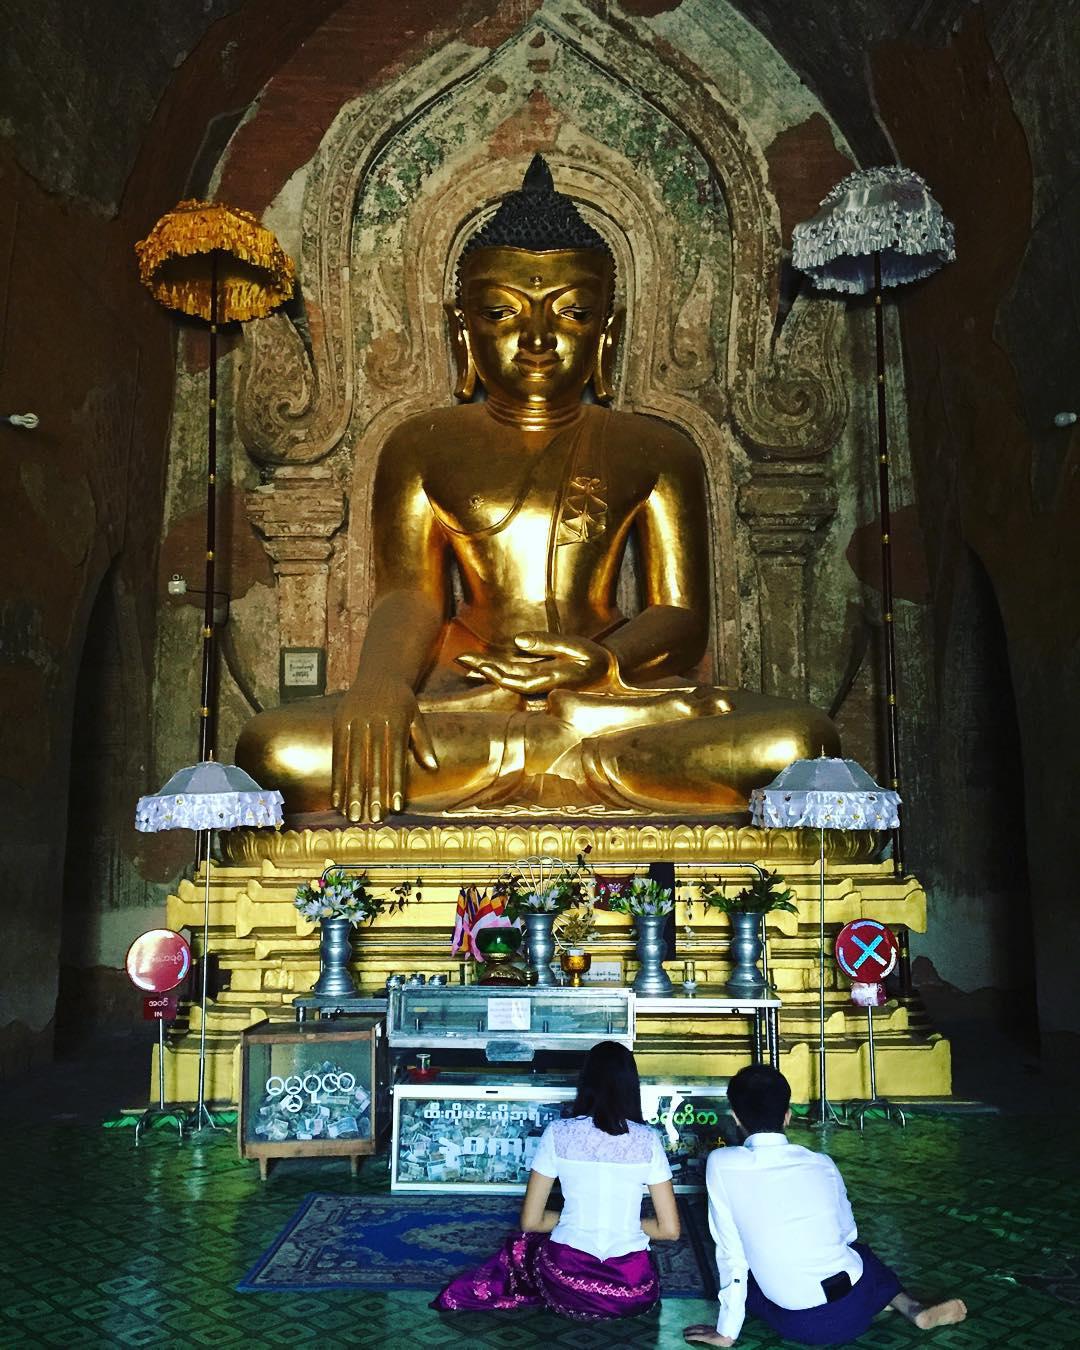 Resplandores #trippingmood #benga #myanmar #bagan